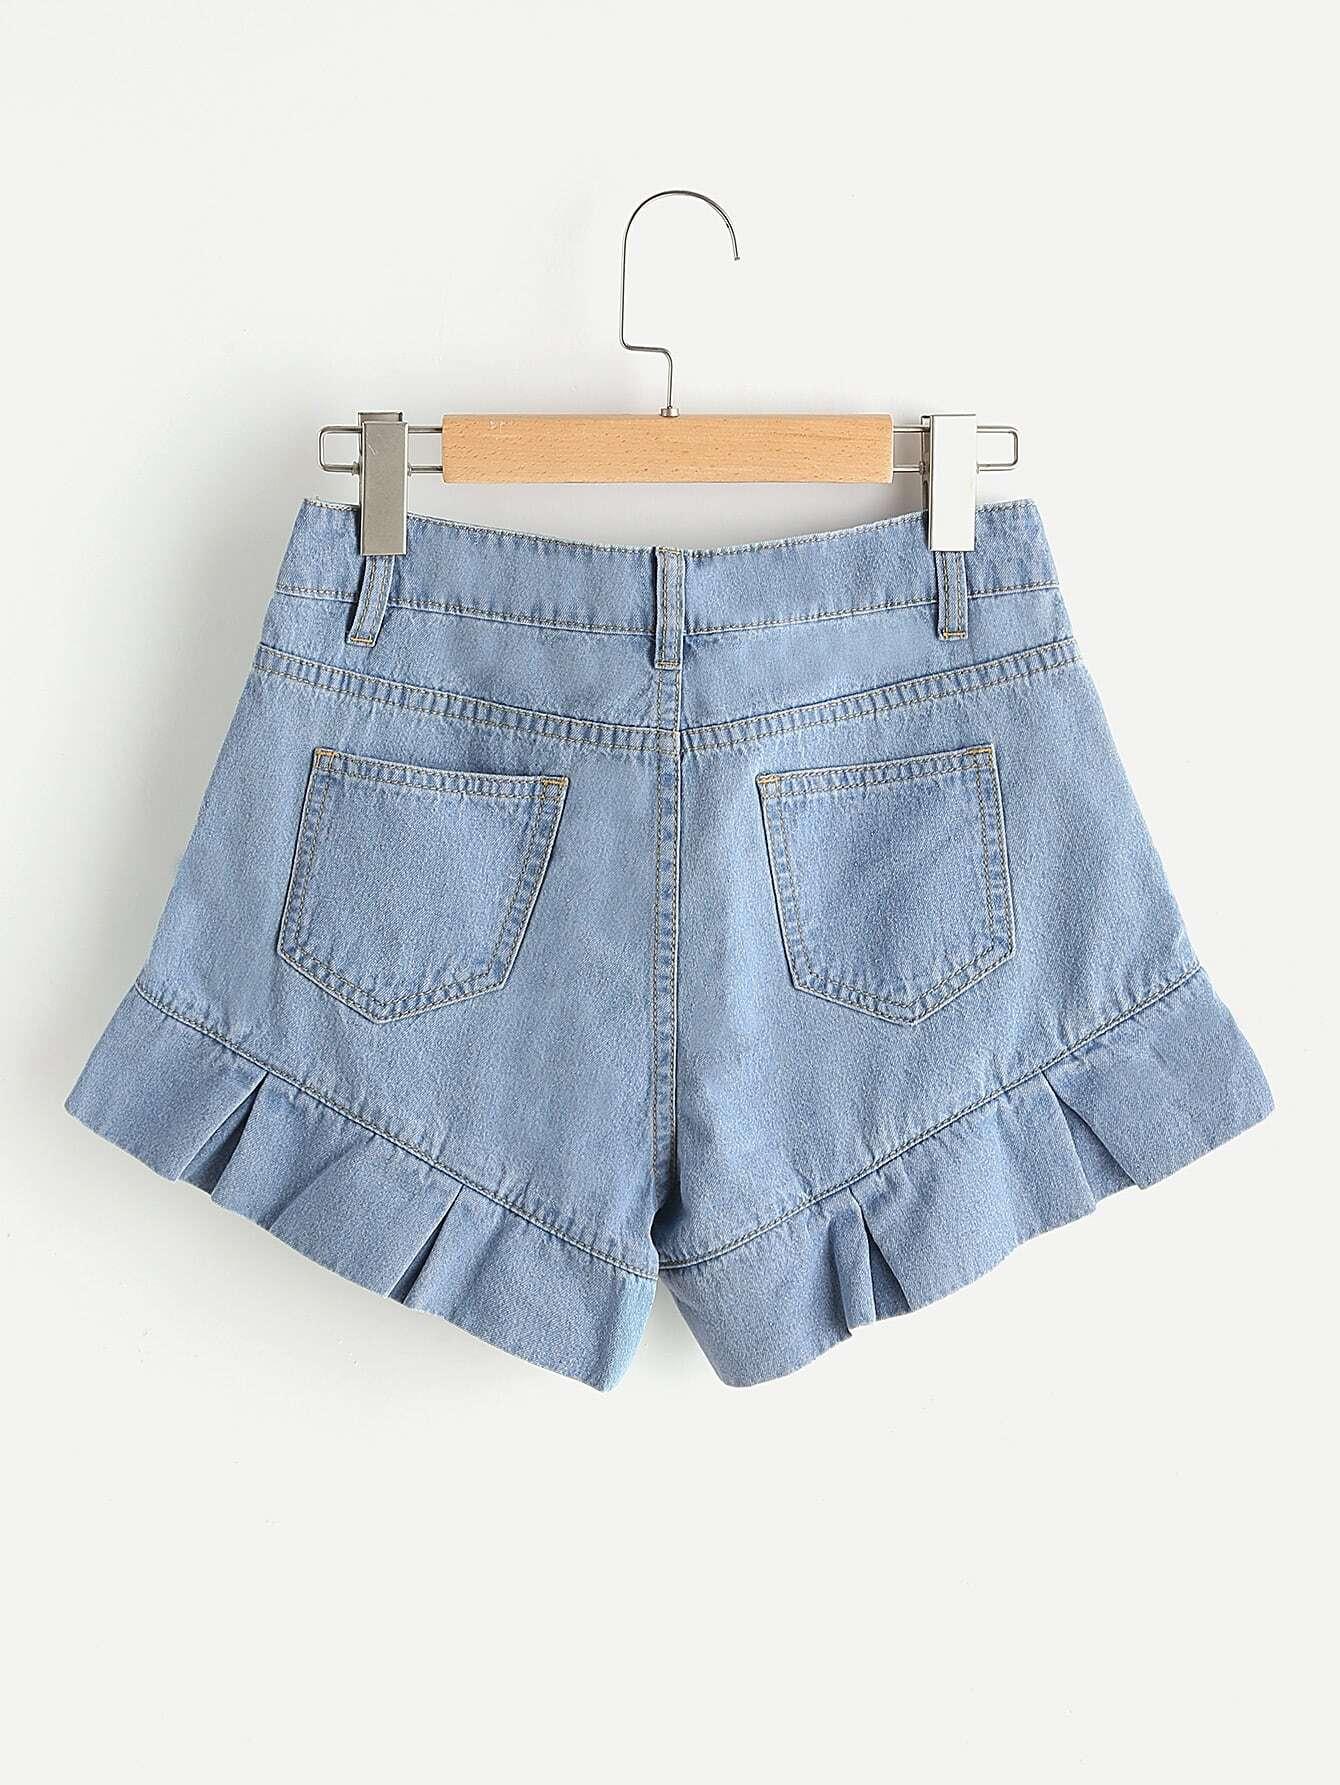 Pleated Ruffle Trim Denim Shorts -SheIn(Sheinside)